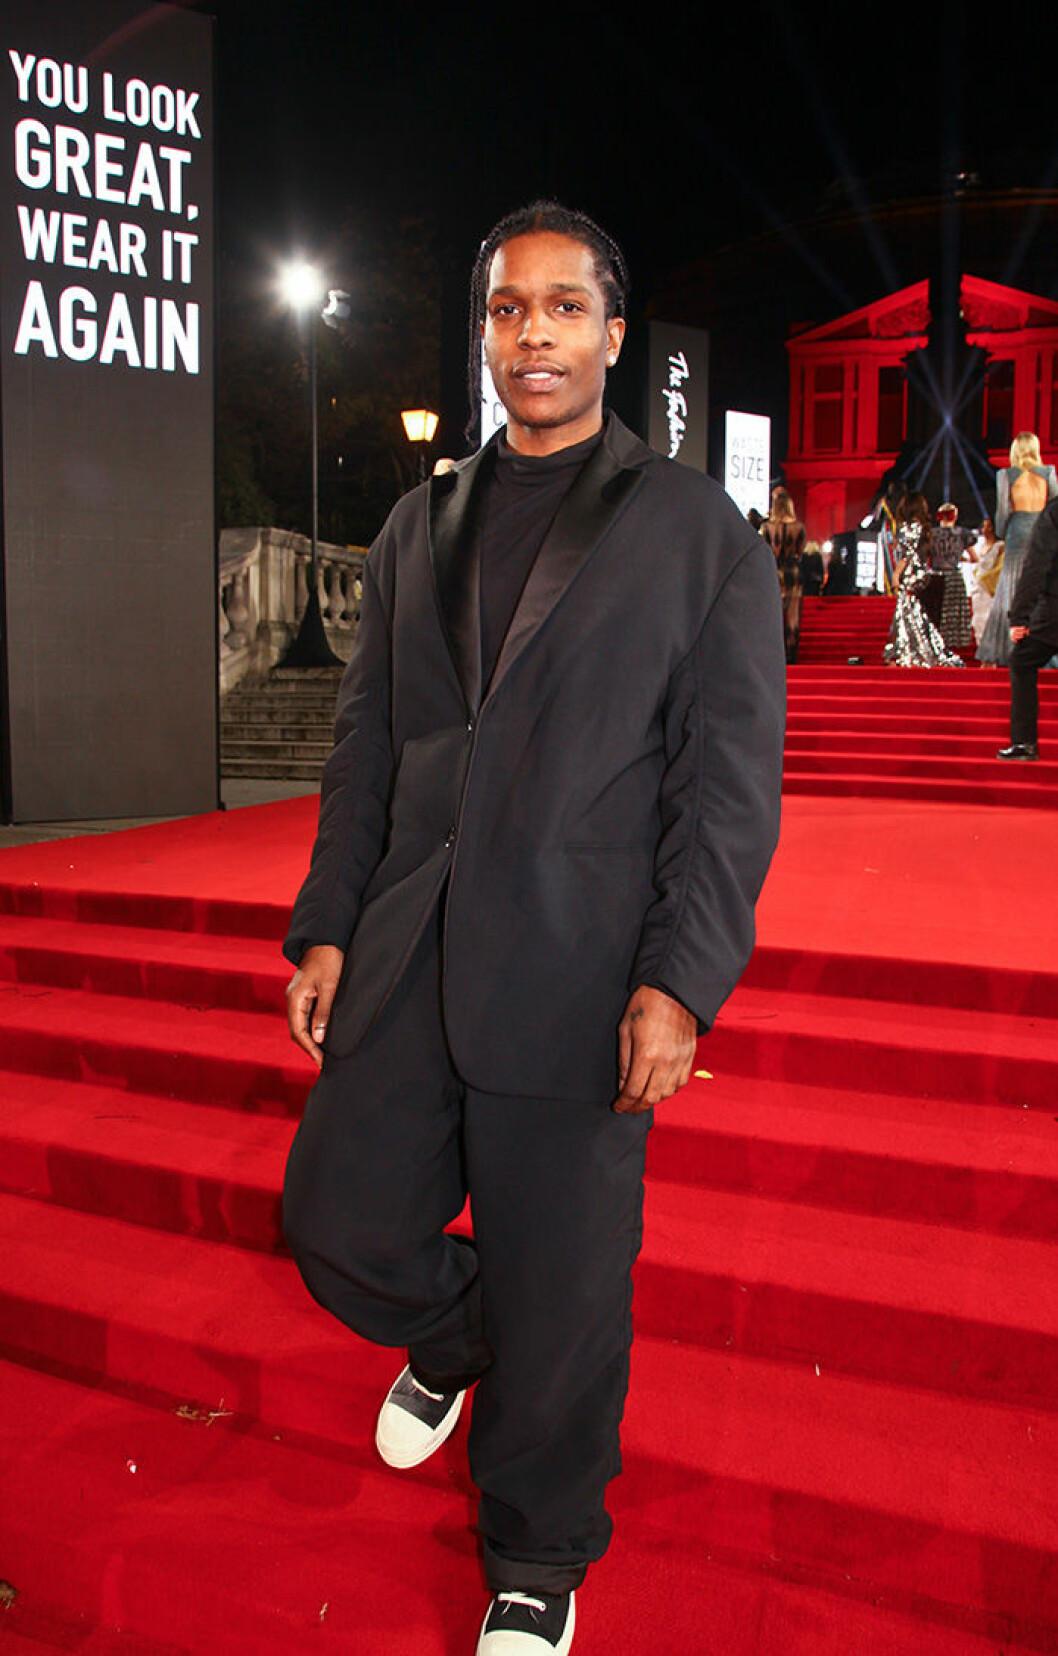 En bild på rapparen ASAP Rocky.